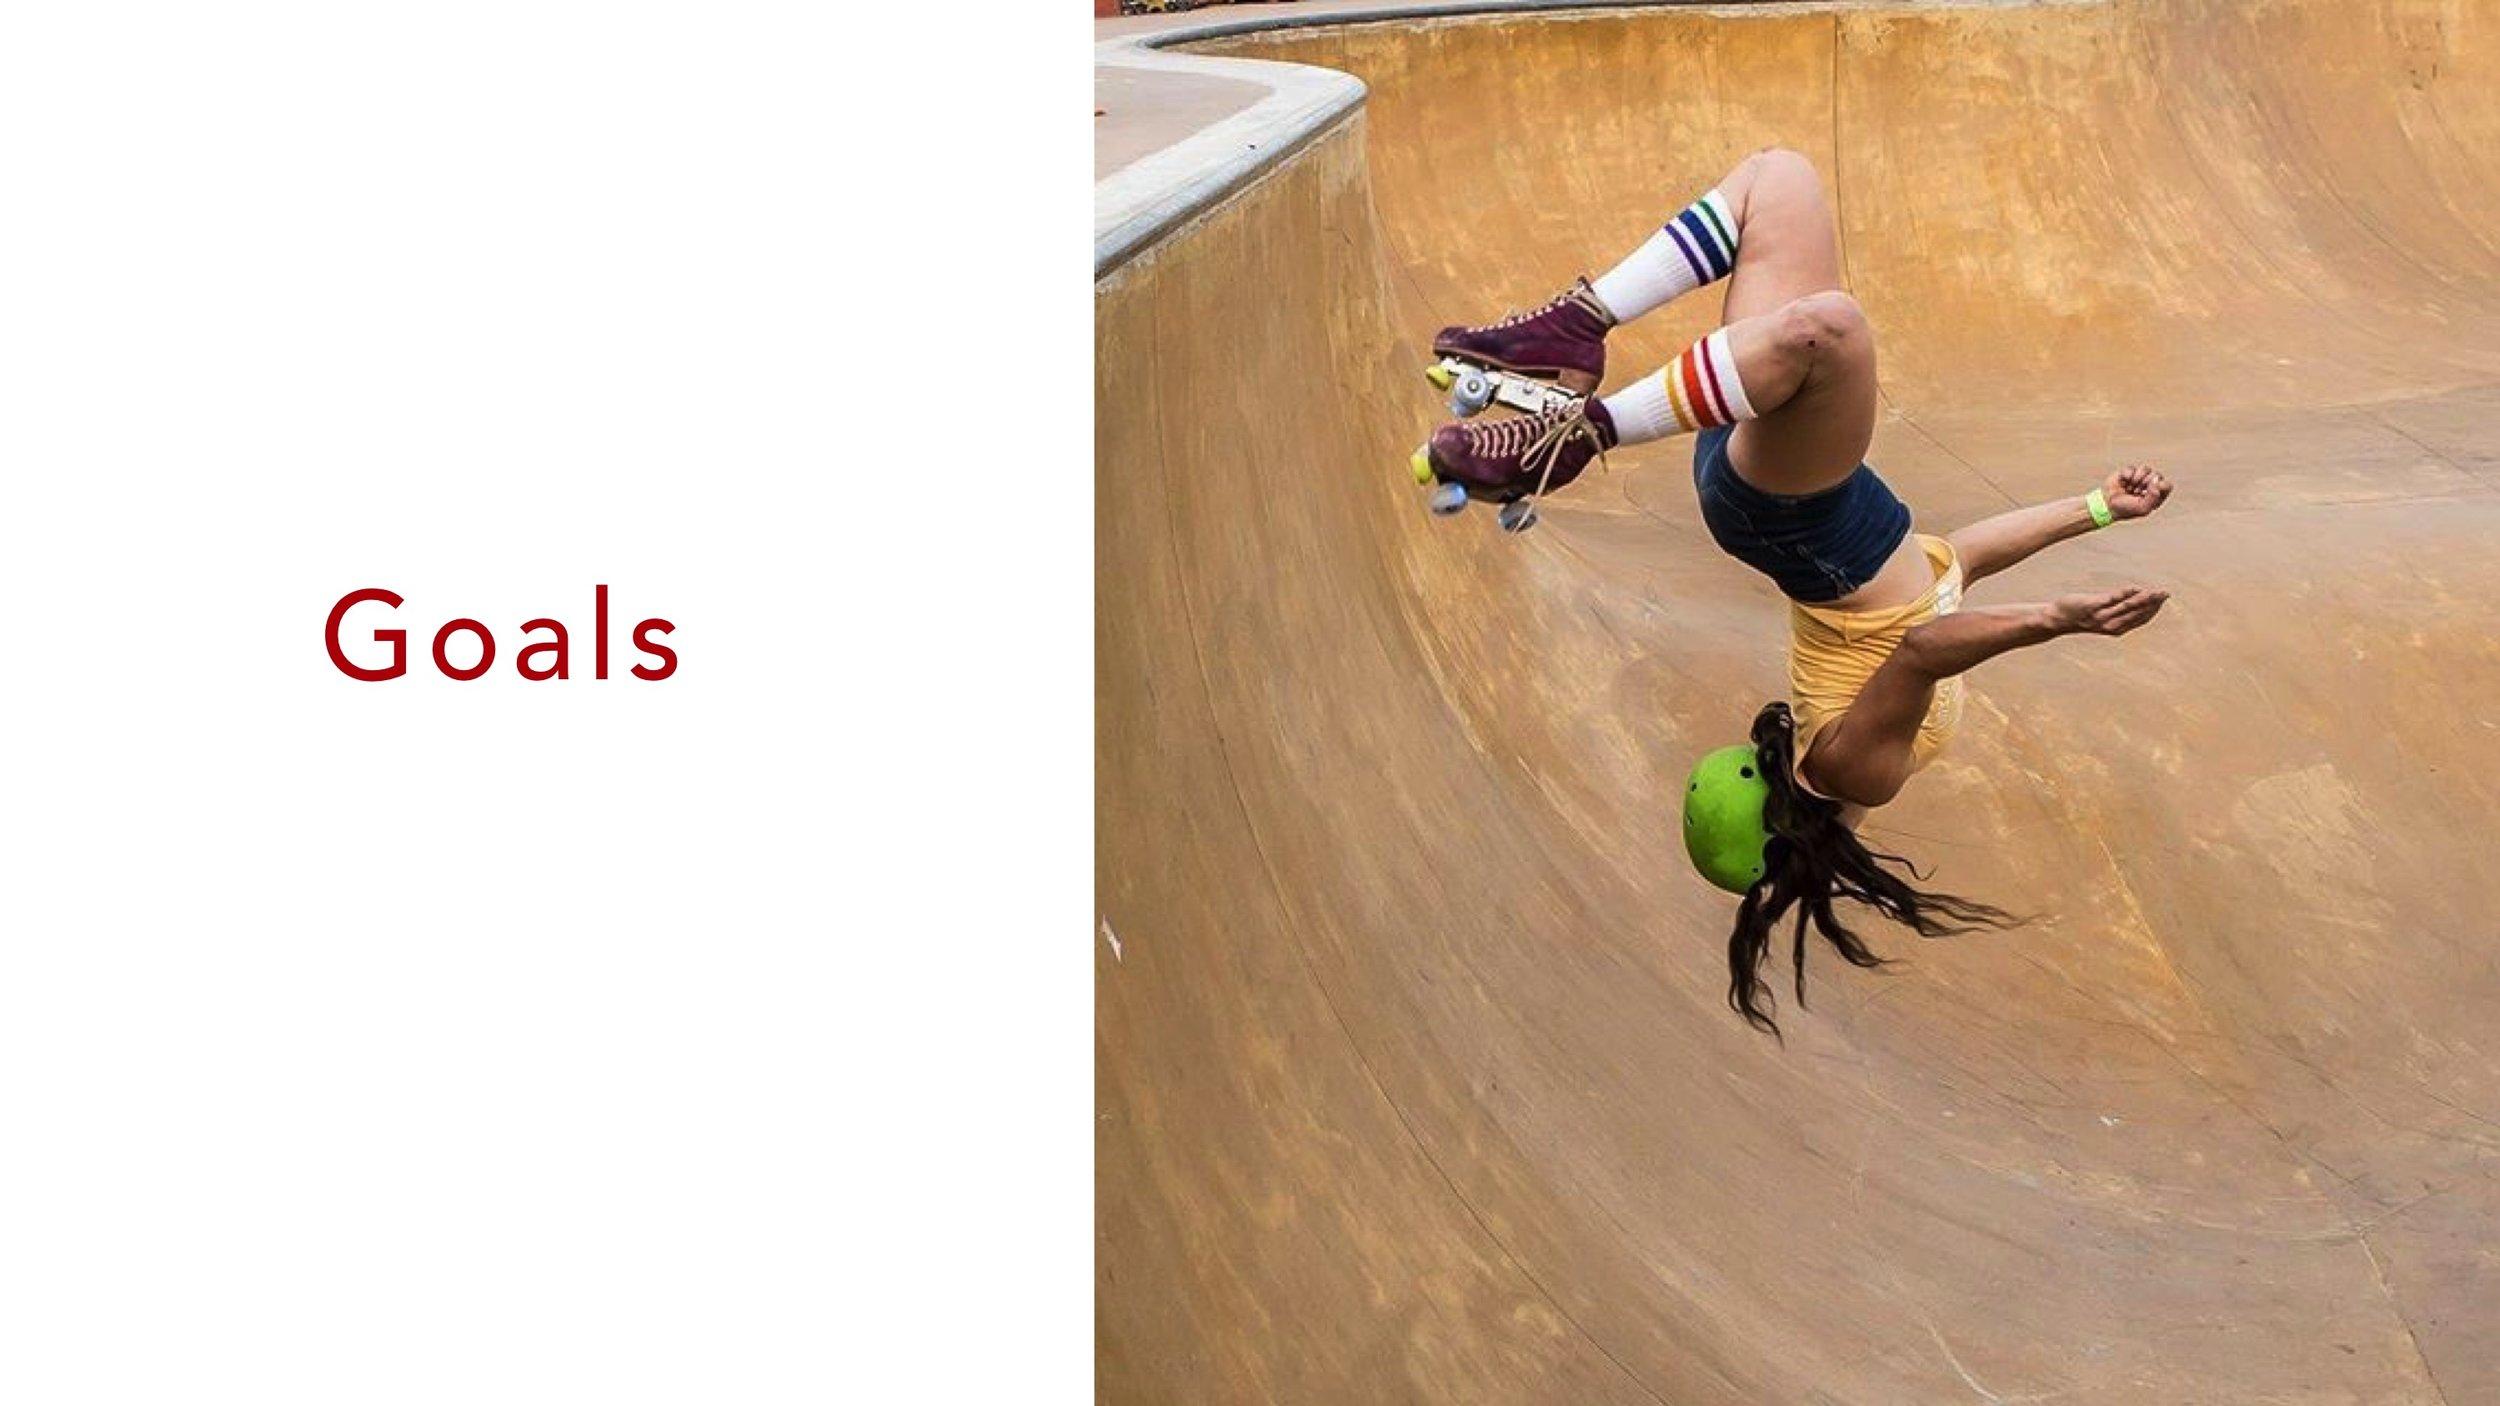 171118-Skate Mate -Jill Daisy -FINAL_Page_11.jpg